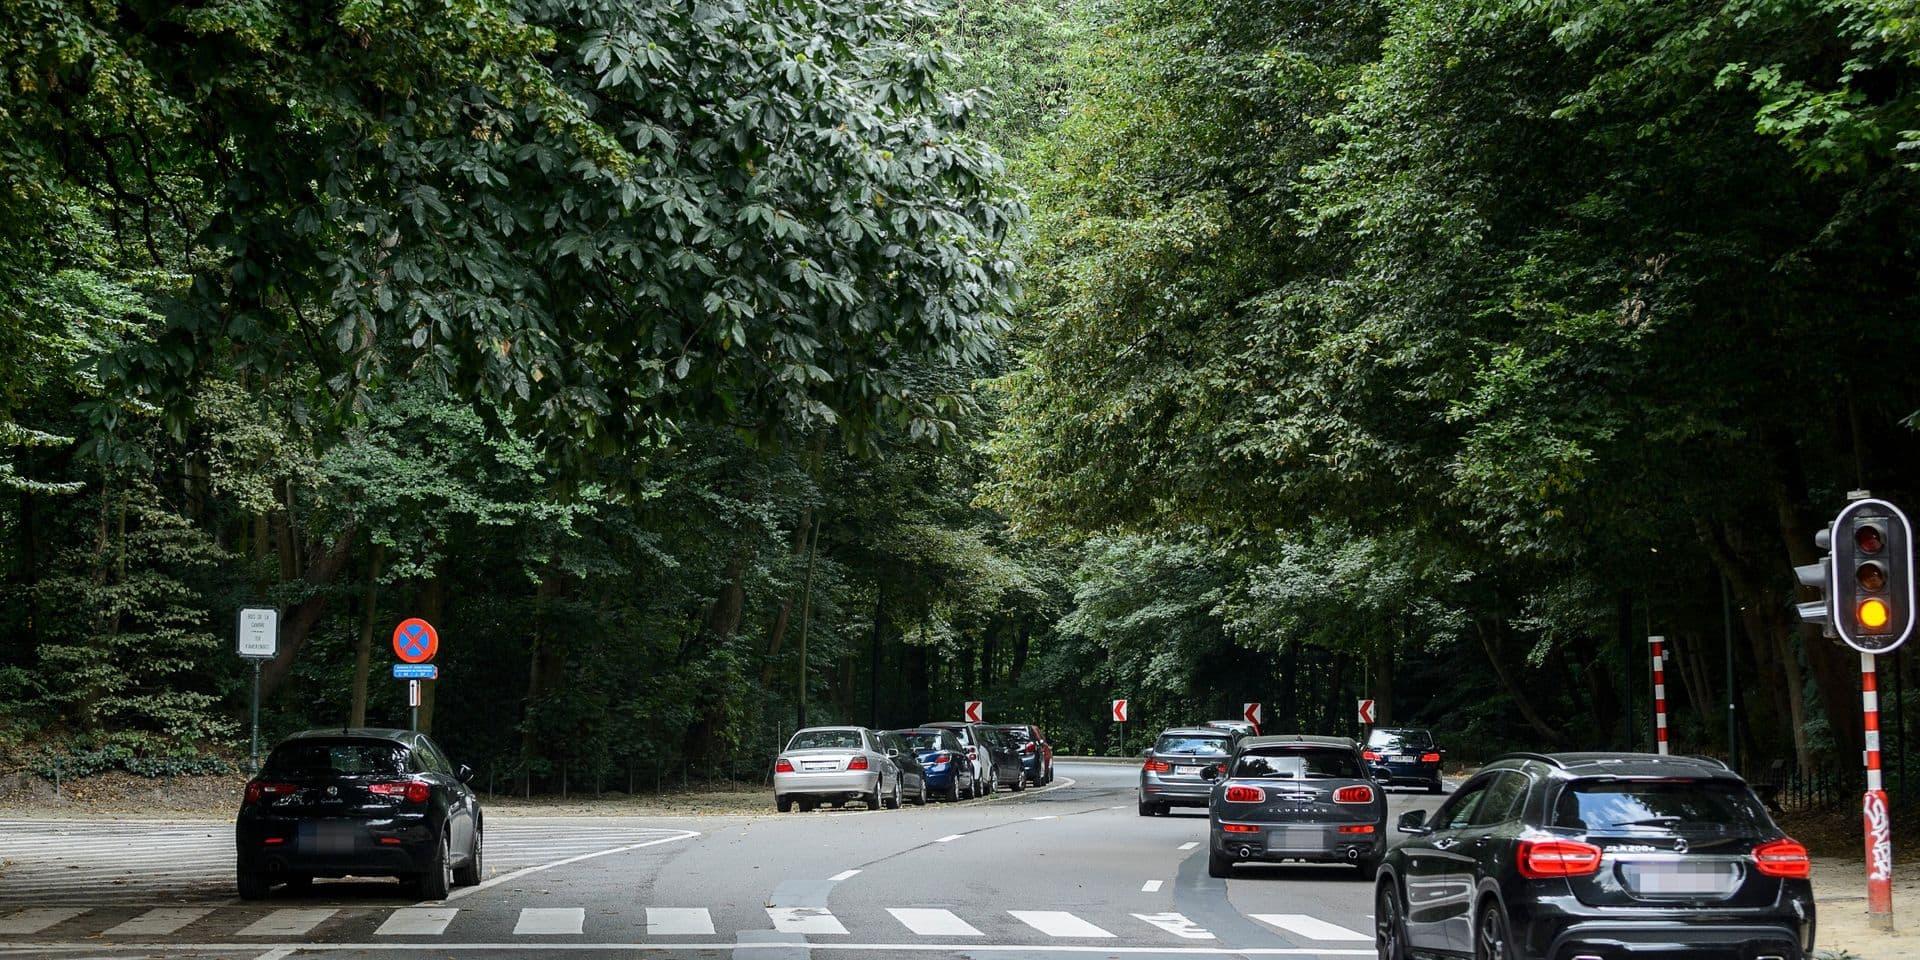 Coronavirus: le bois de la Cambre sera fermé à la circulation dès jeudi matin